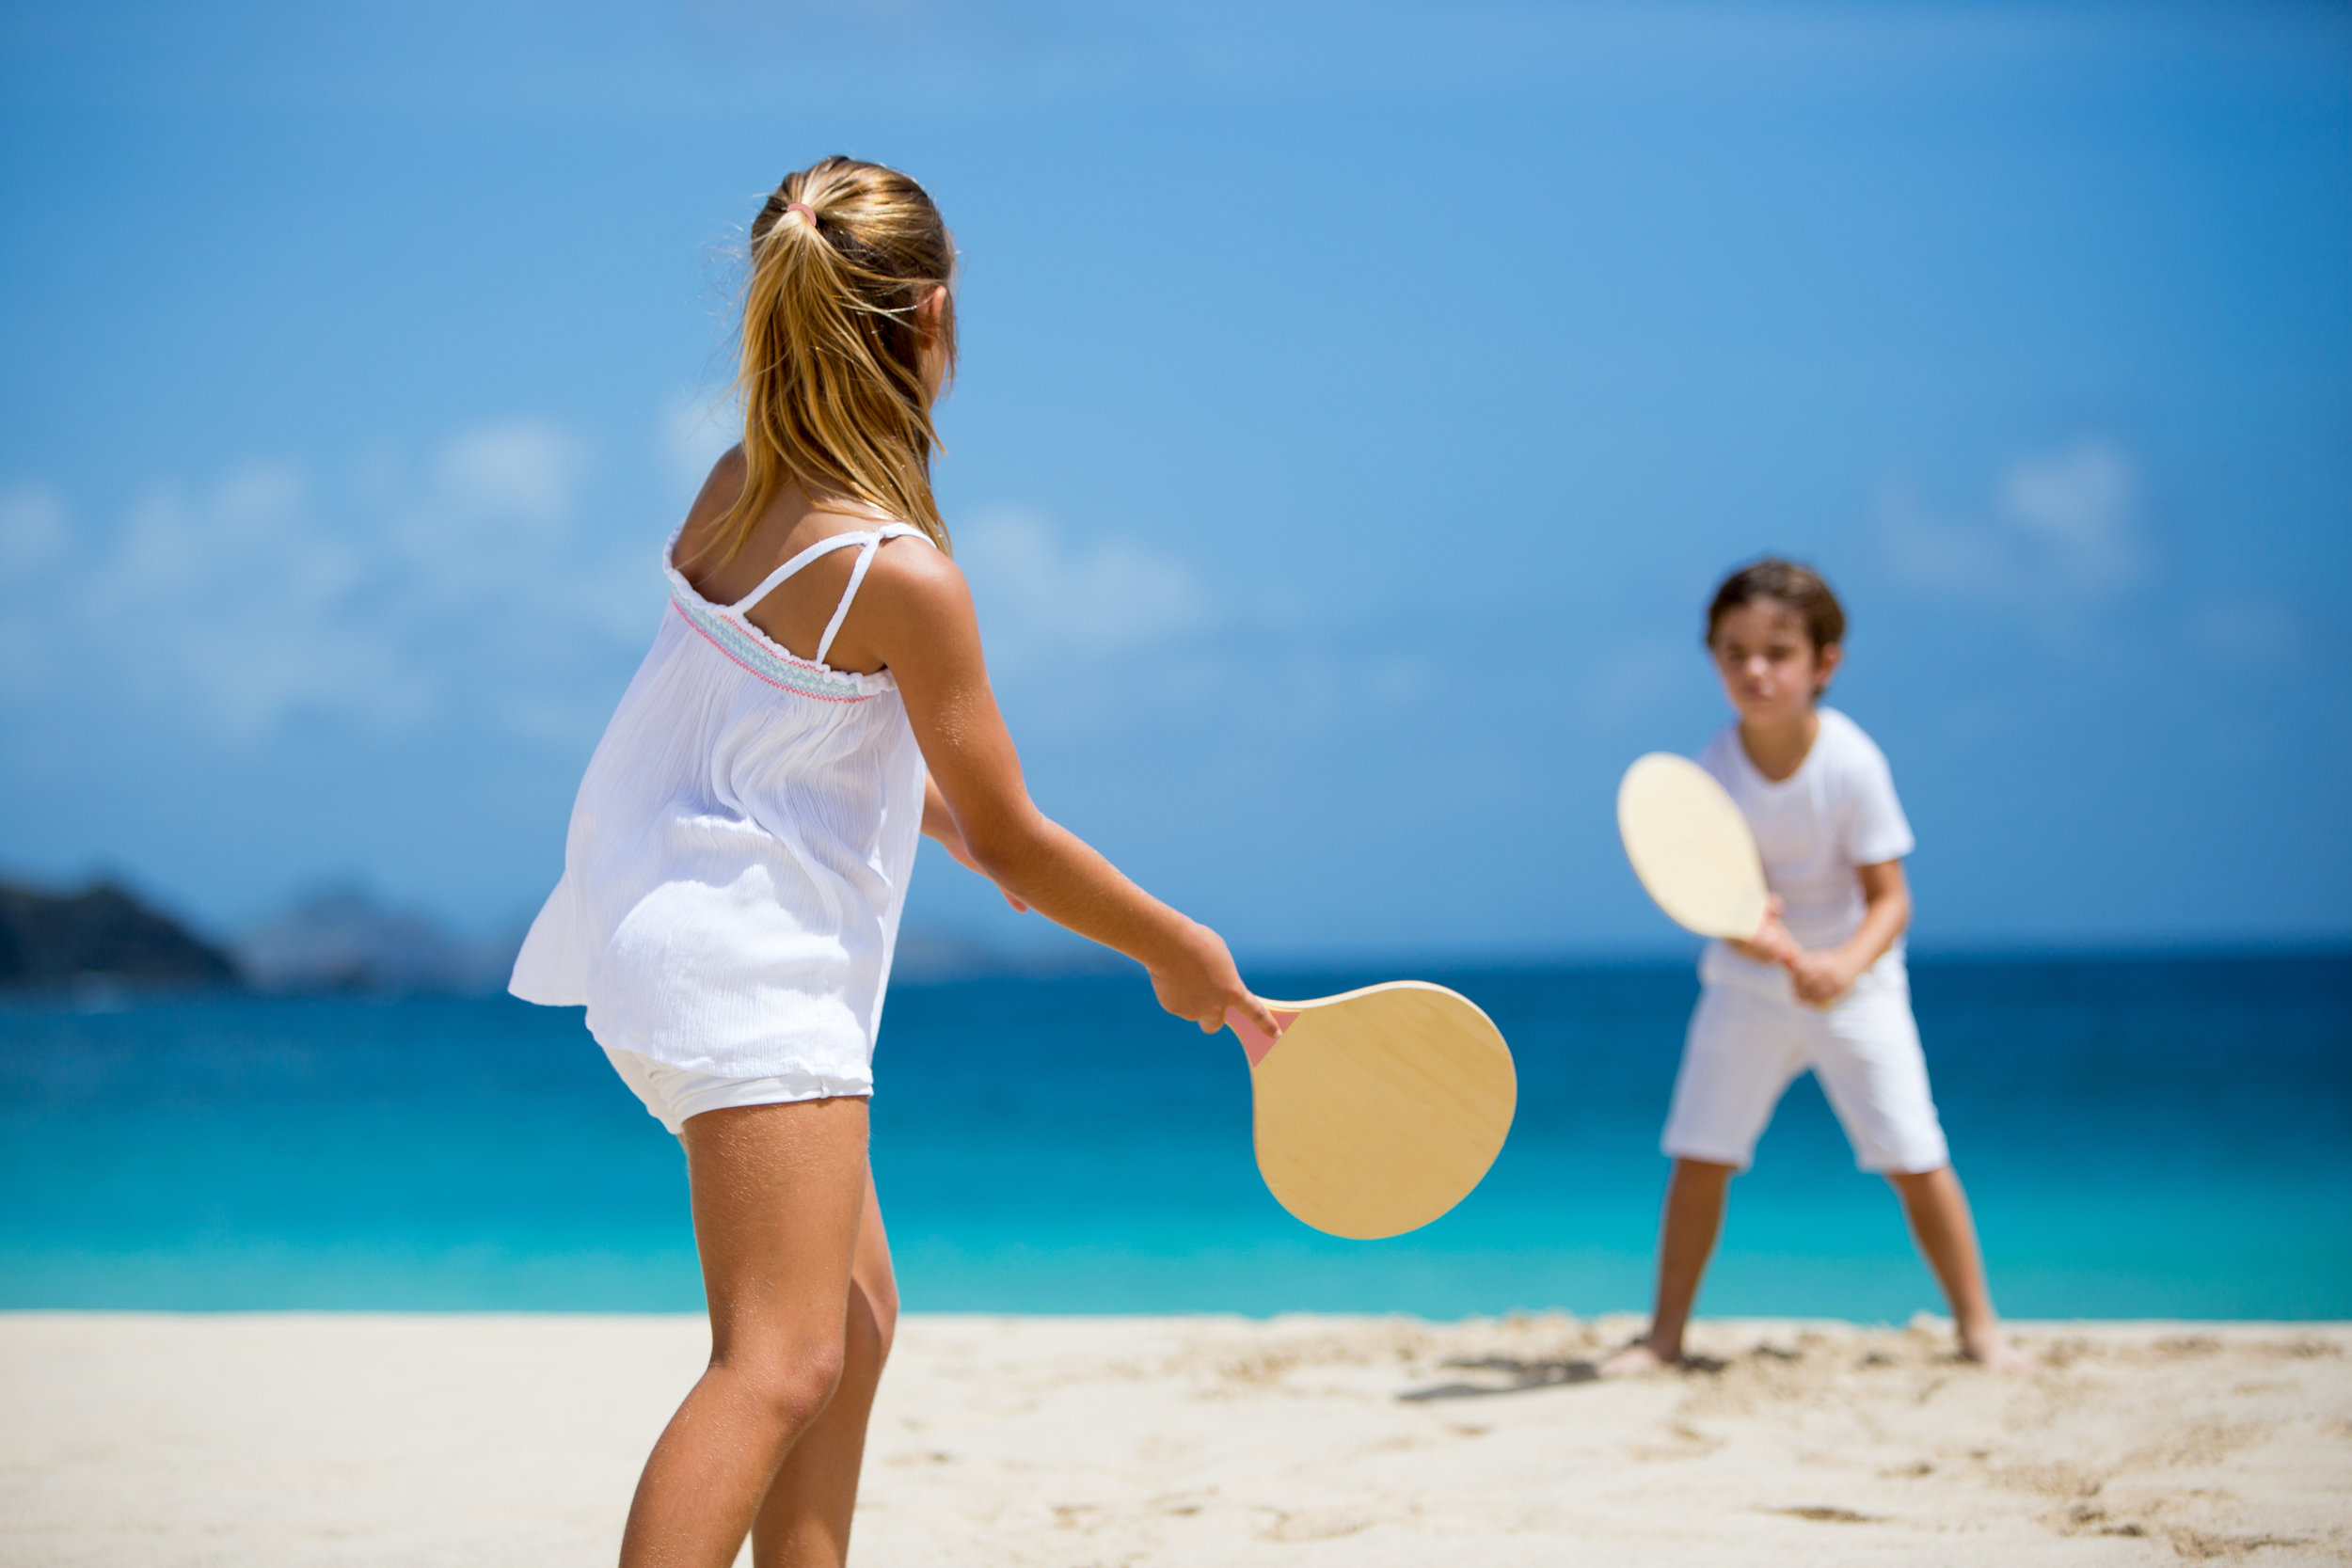 20150825125555_05-03-children-on-the-beach-p-carreau.jpg